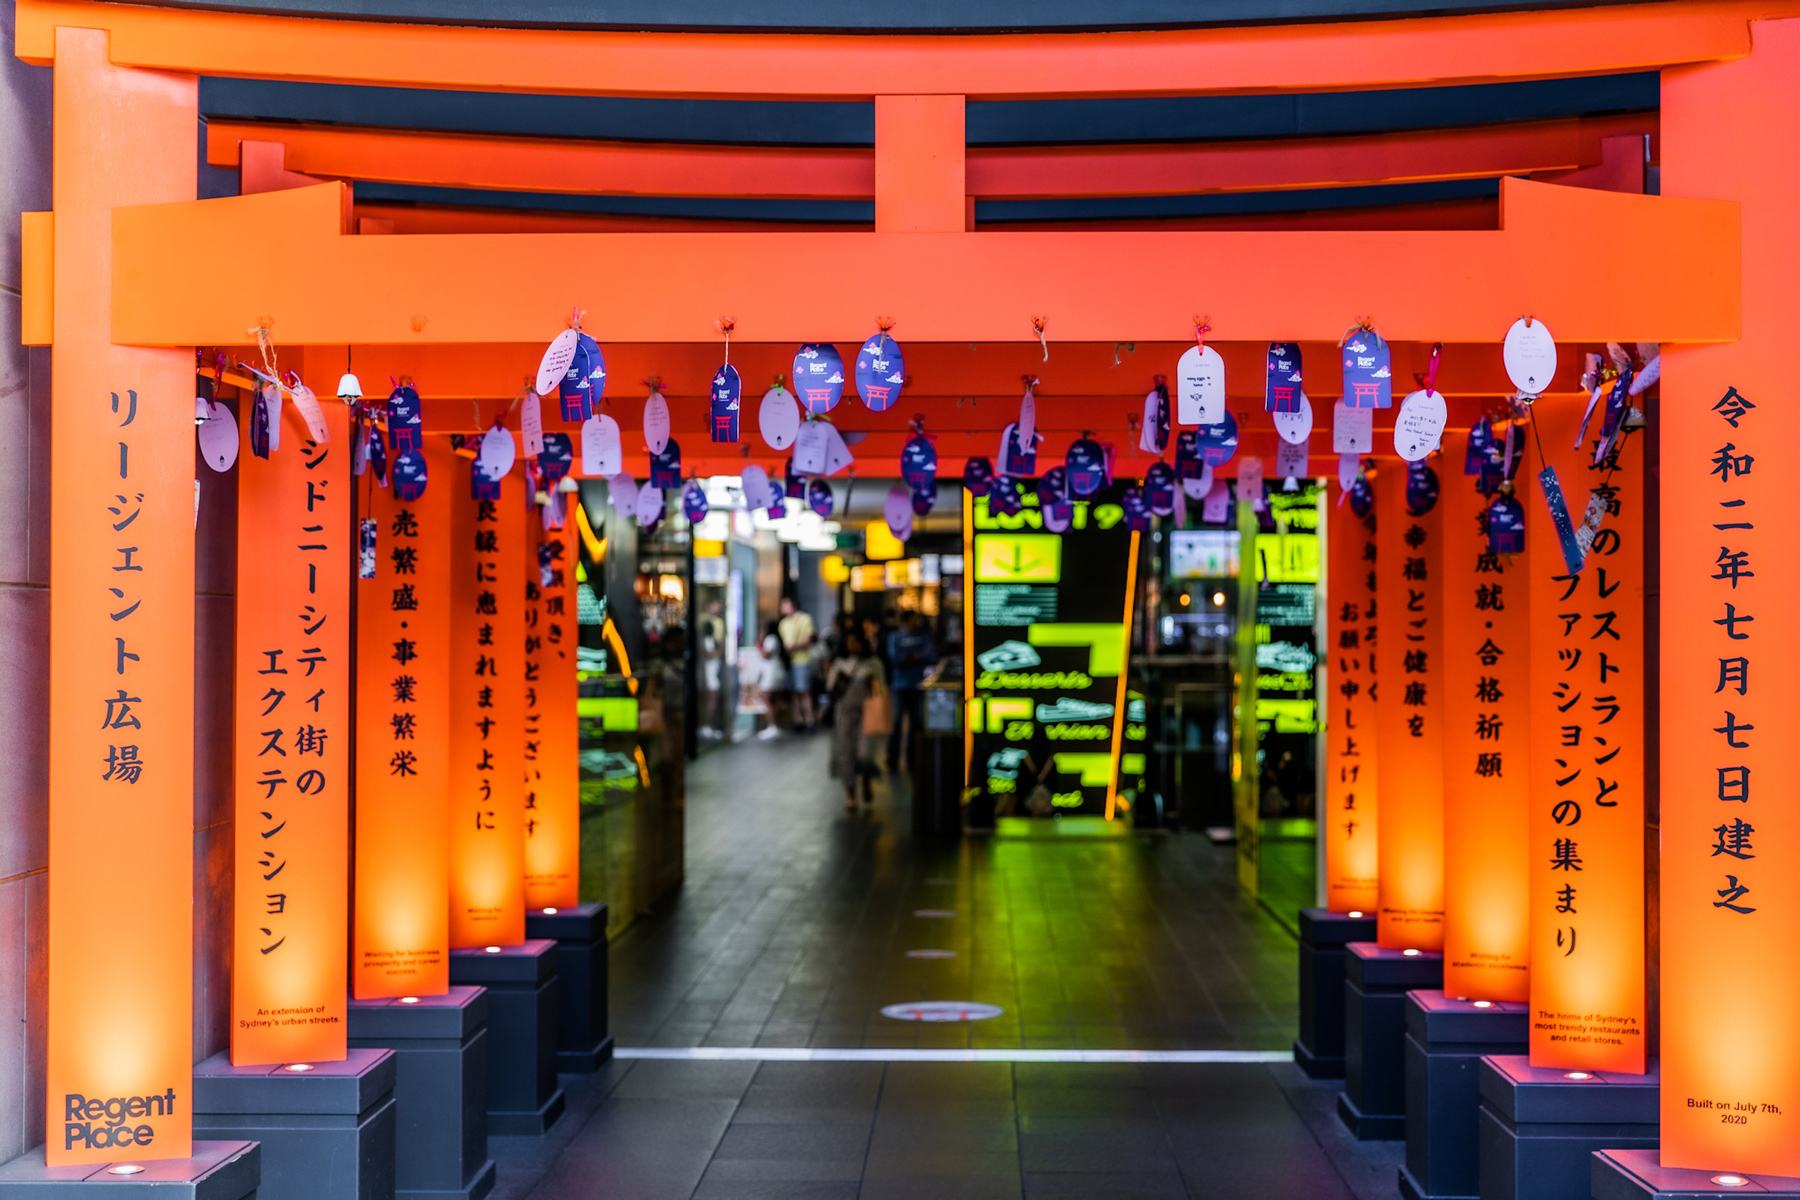 regent-place-torii-gate-installation-tag-design